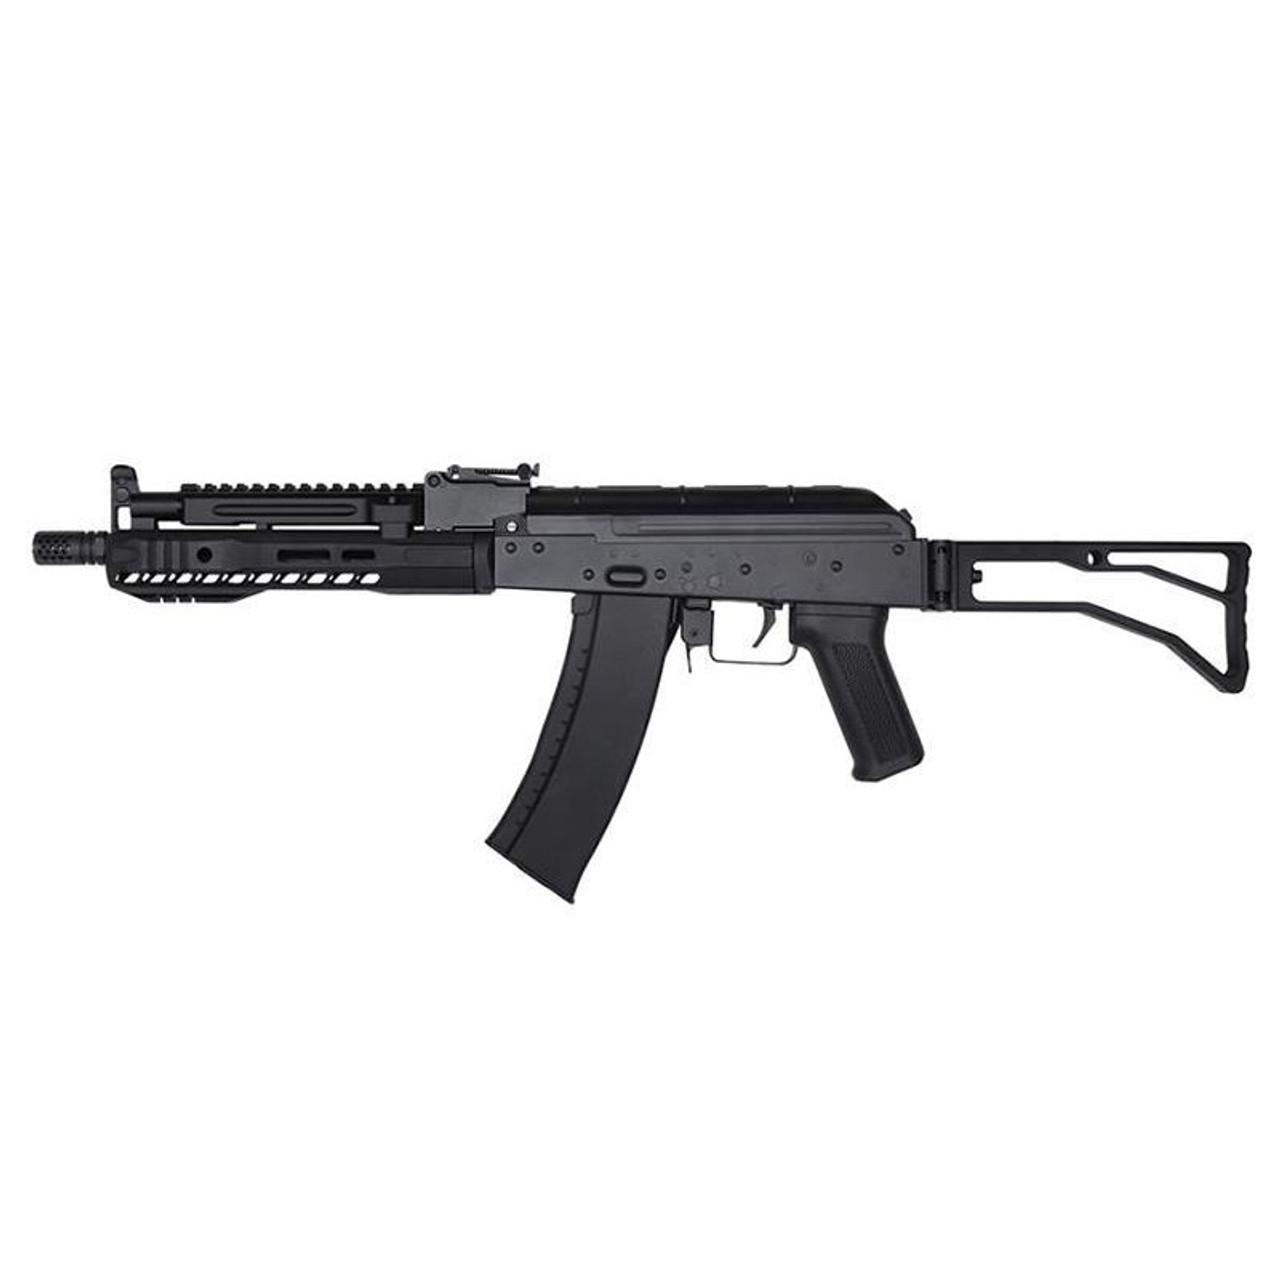 Dytac SLR AK105 AEG Rifle